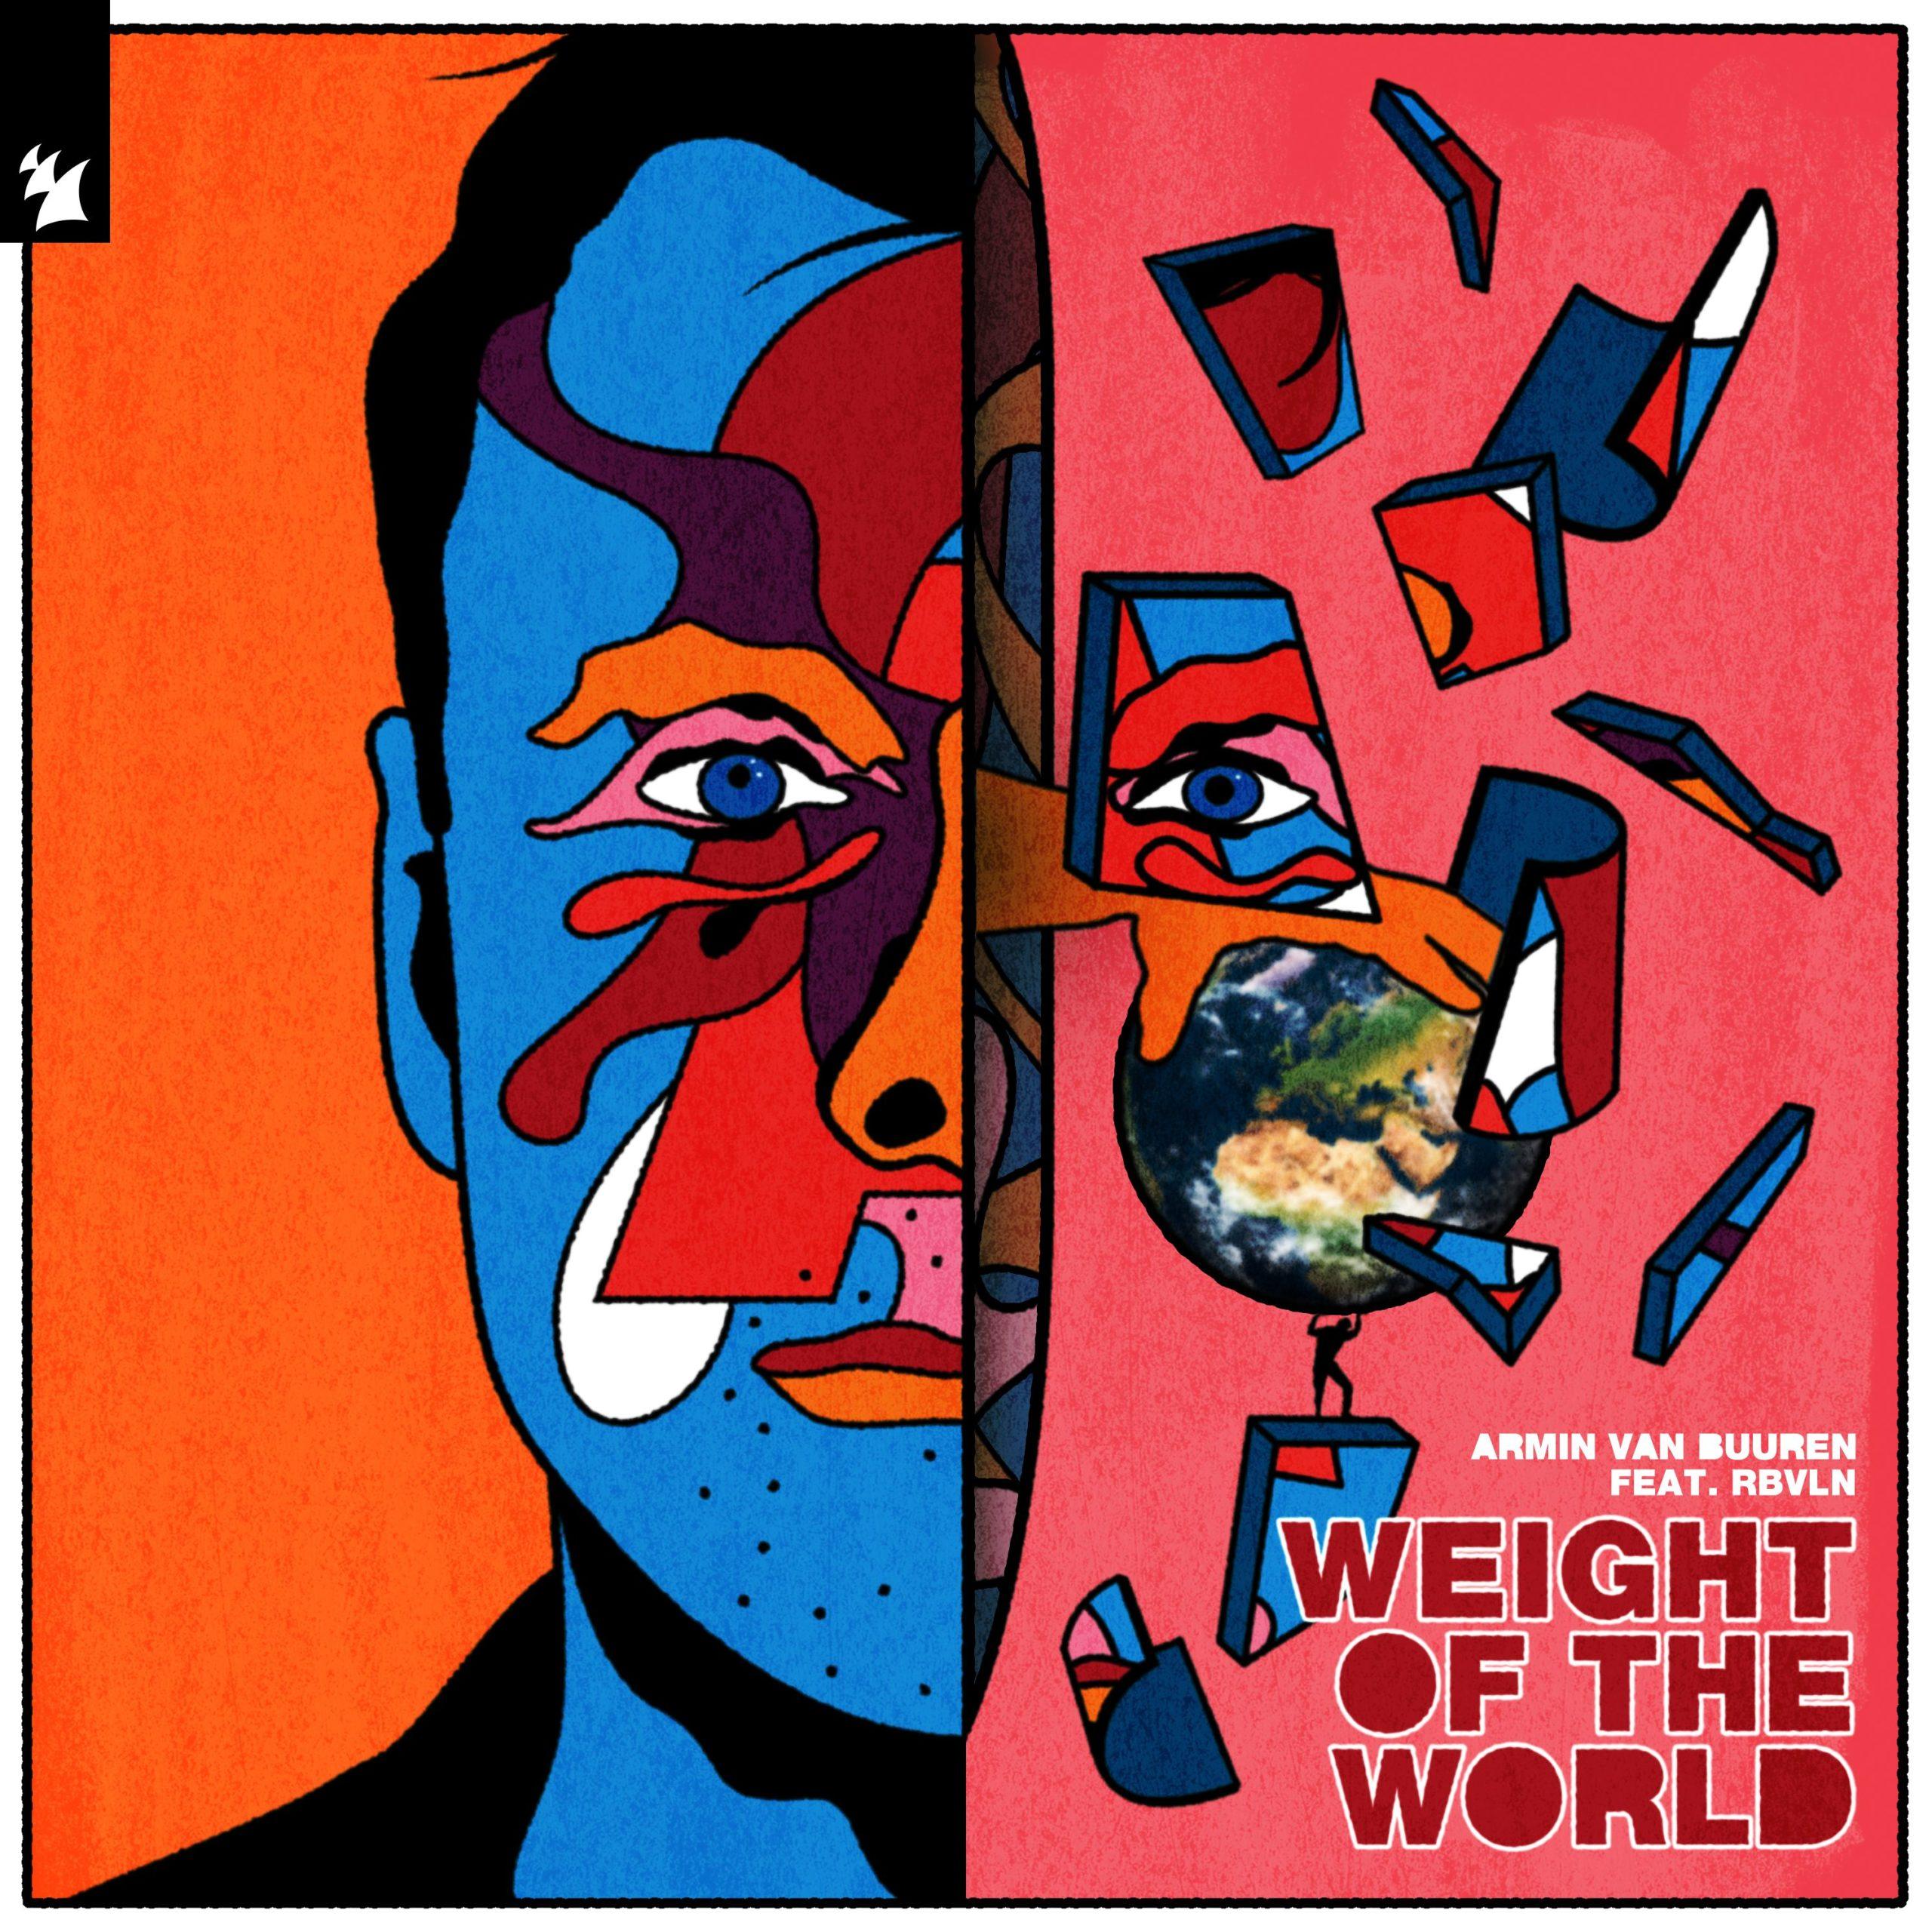 Armin van Buuren feat. RBVLN – Weight Of The World